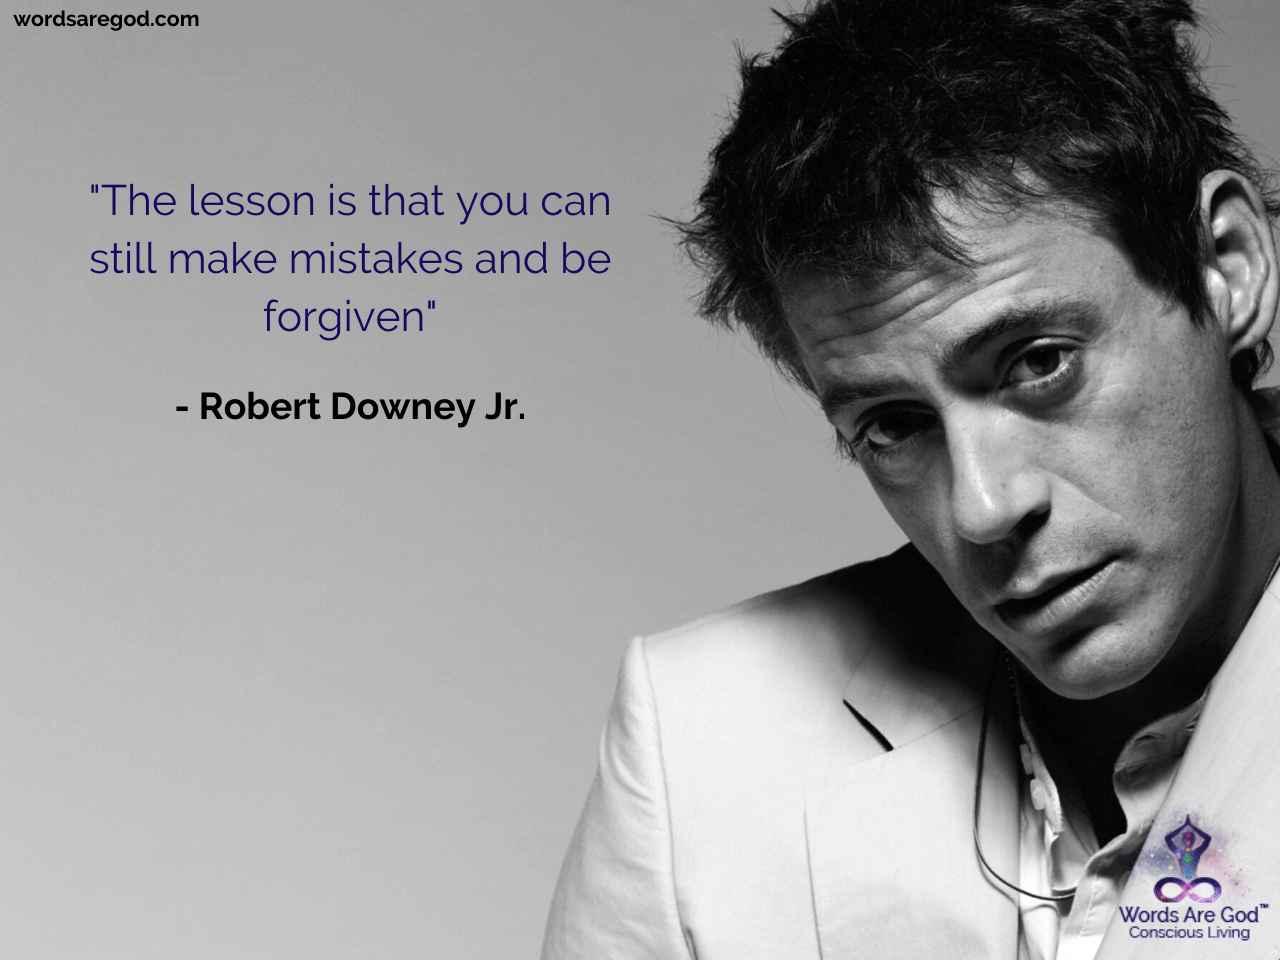 Robert Downey Jr. Life Quote by Robert Downey Jr.